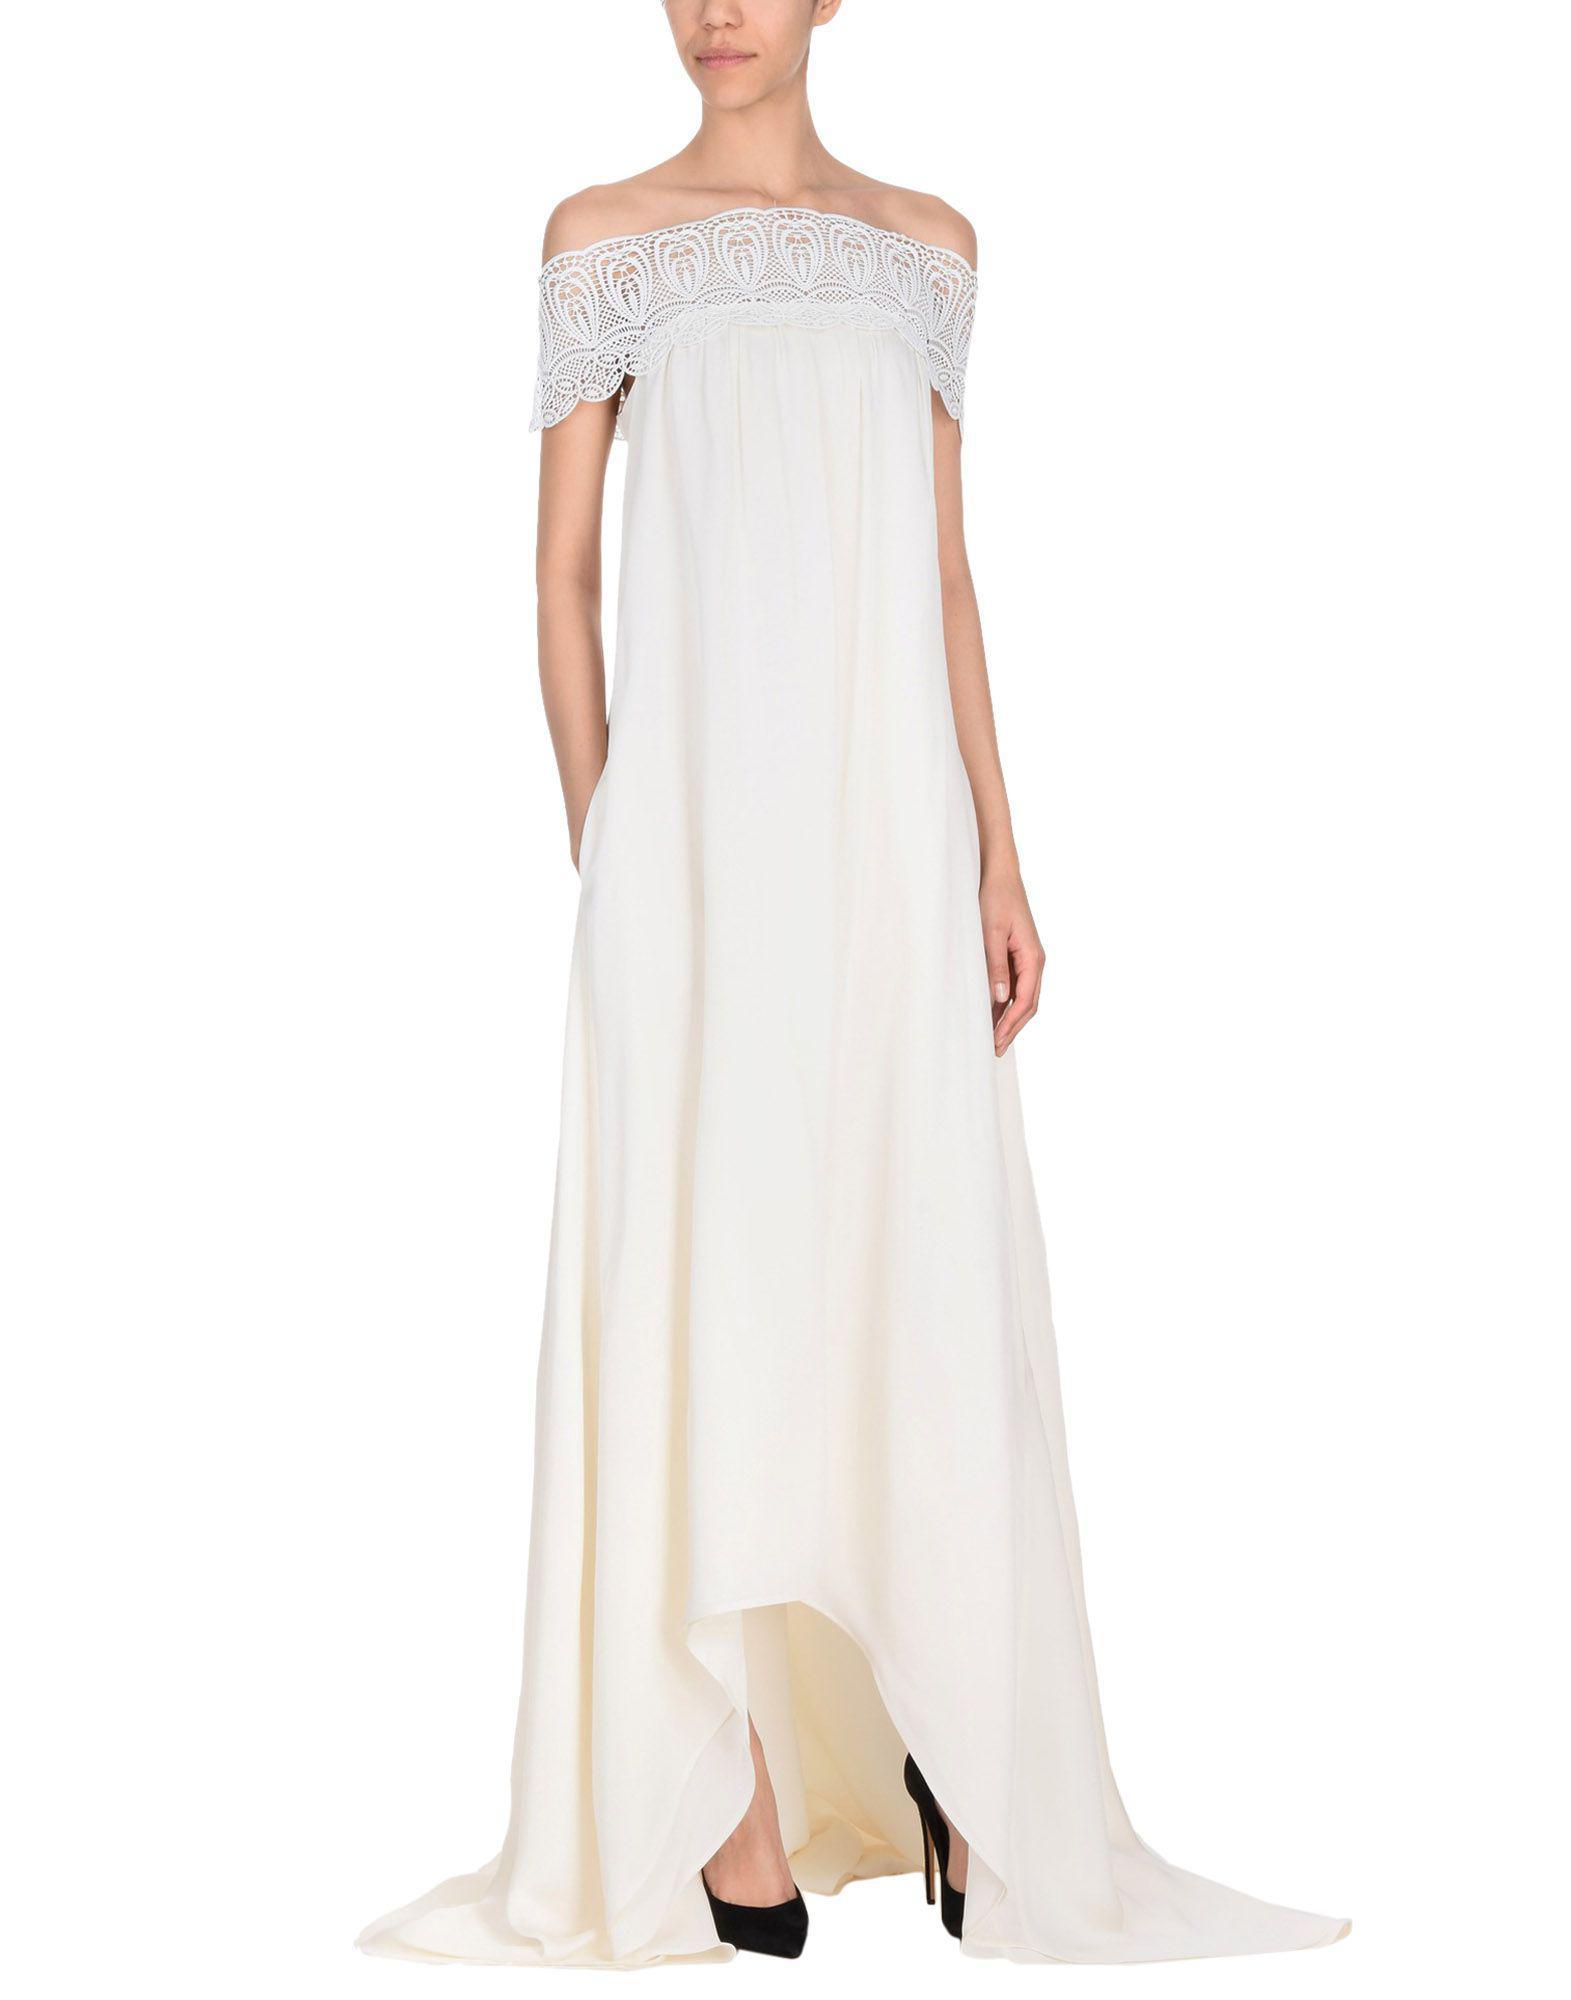 Self-Portrait Lace Long Dress in Ivory (White)